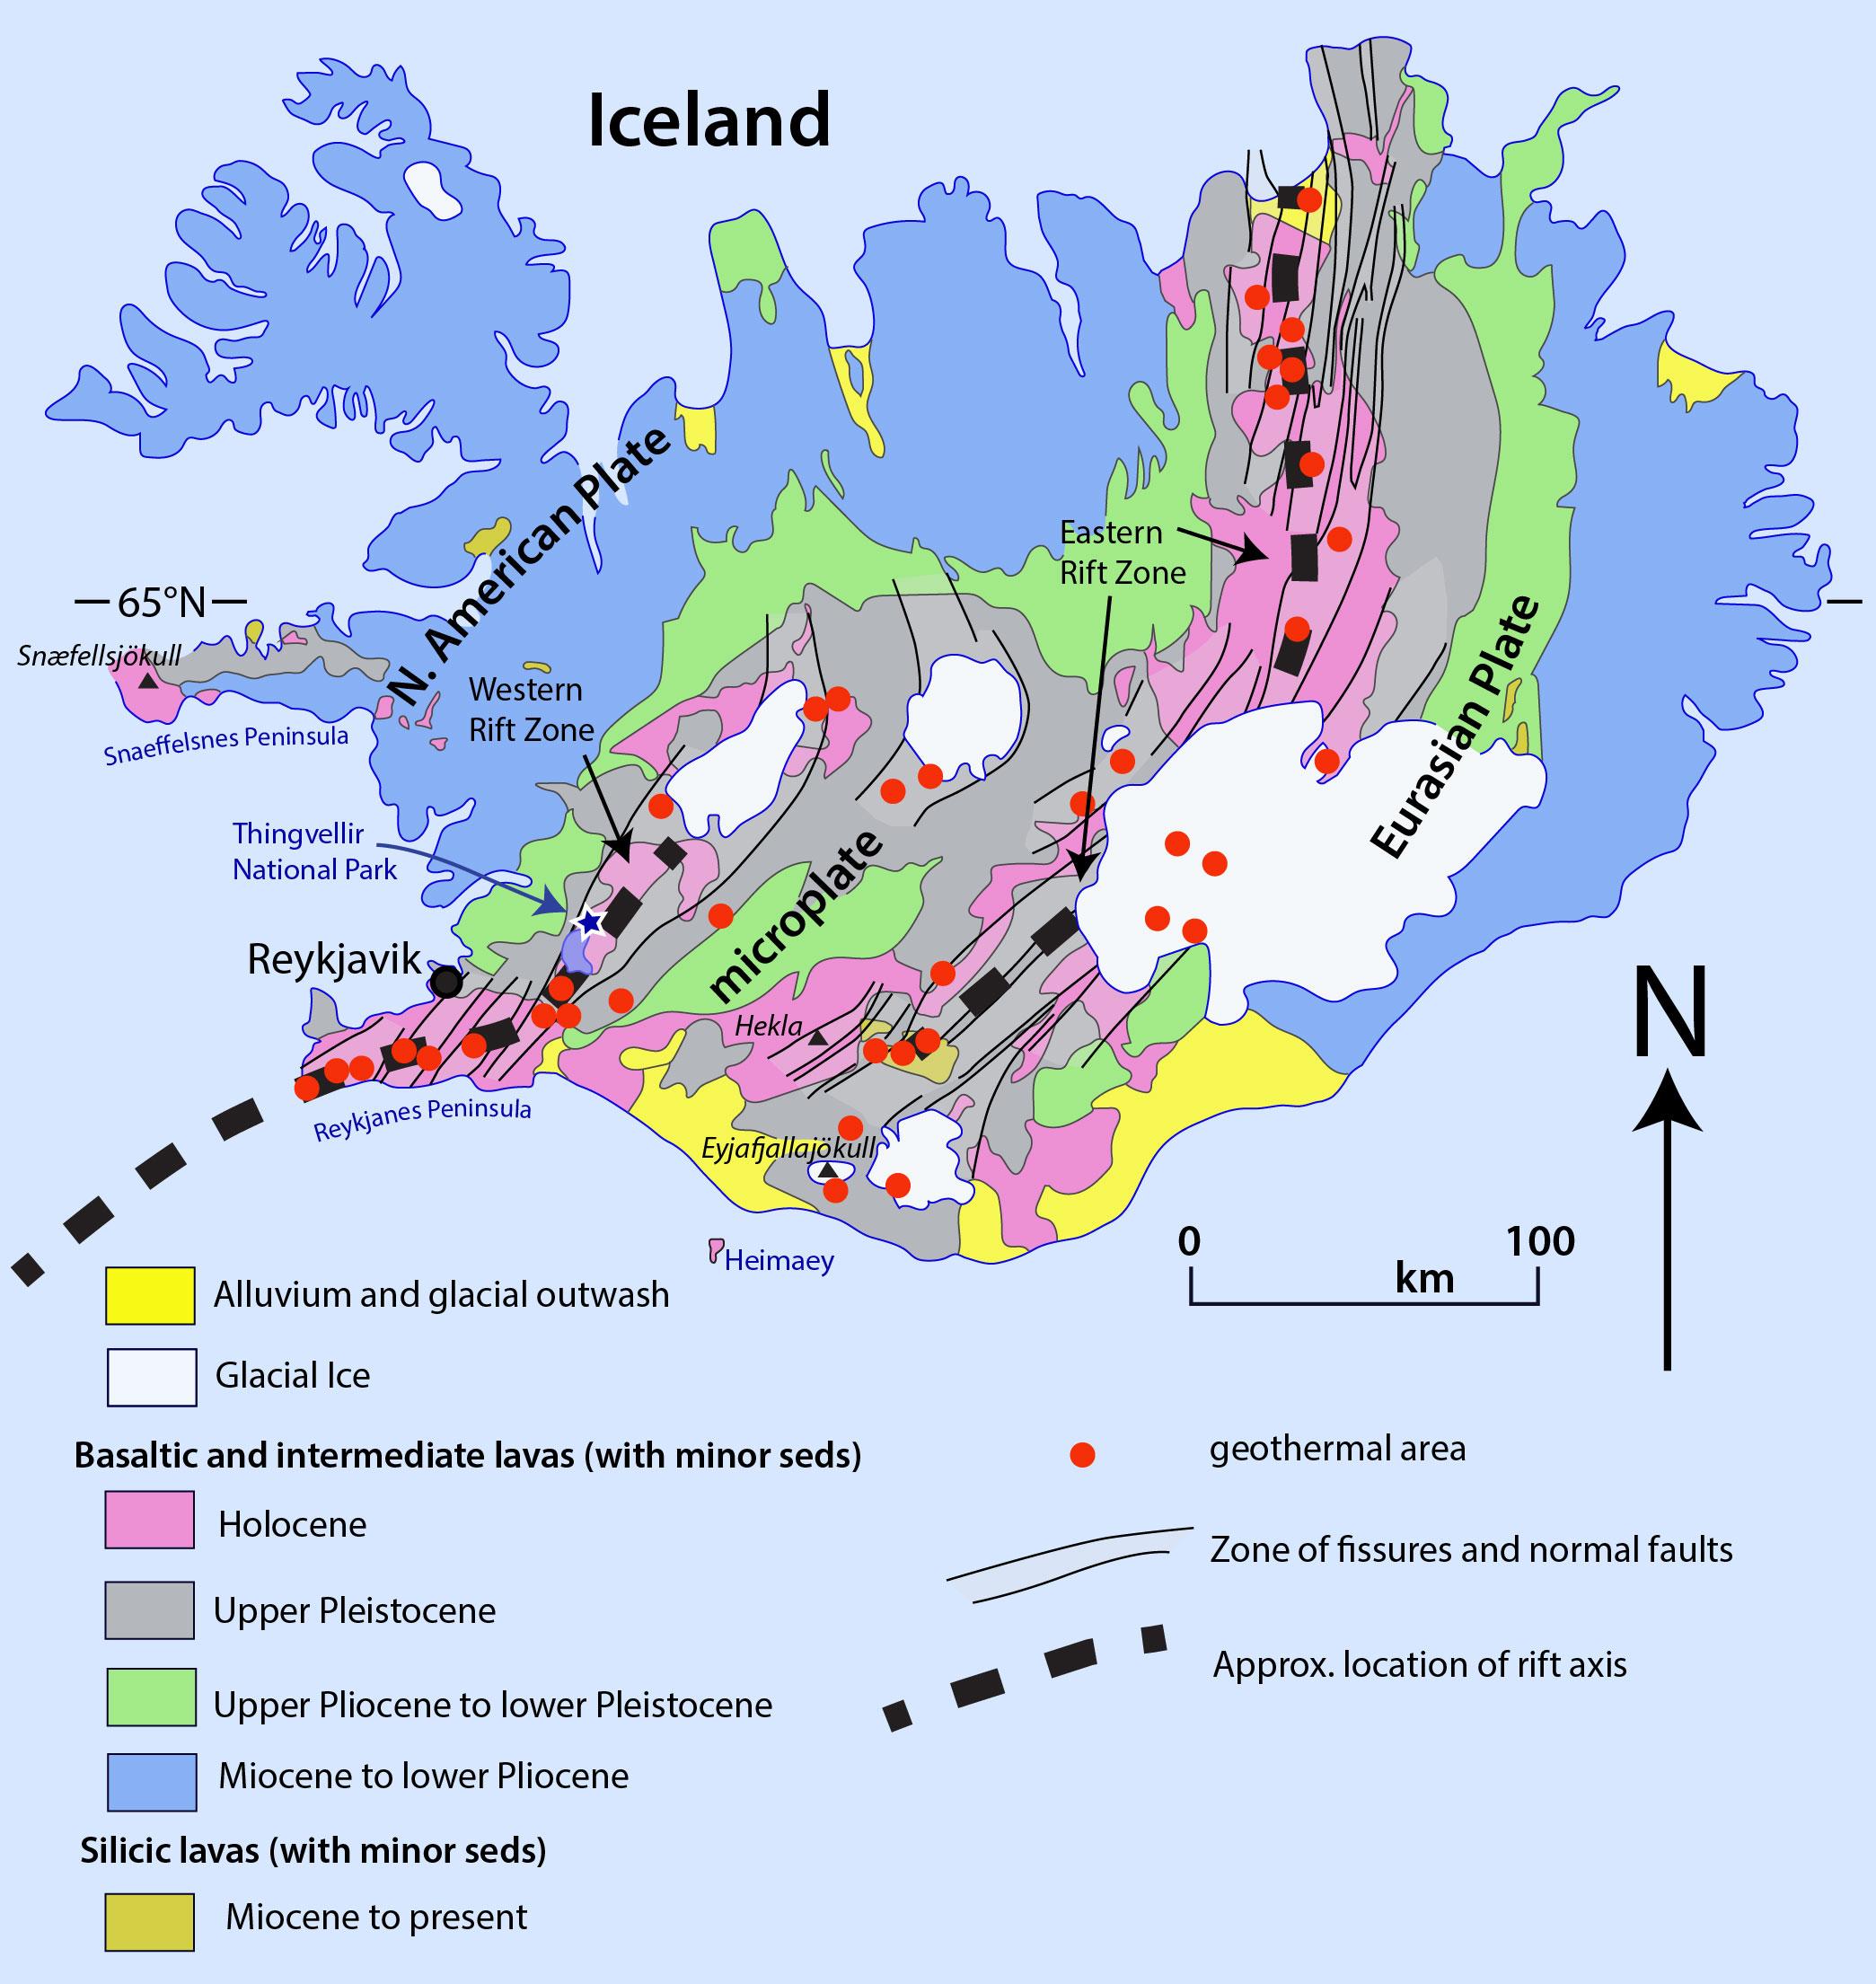 Iceland2geomapplates